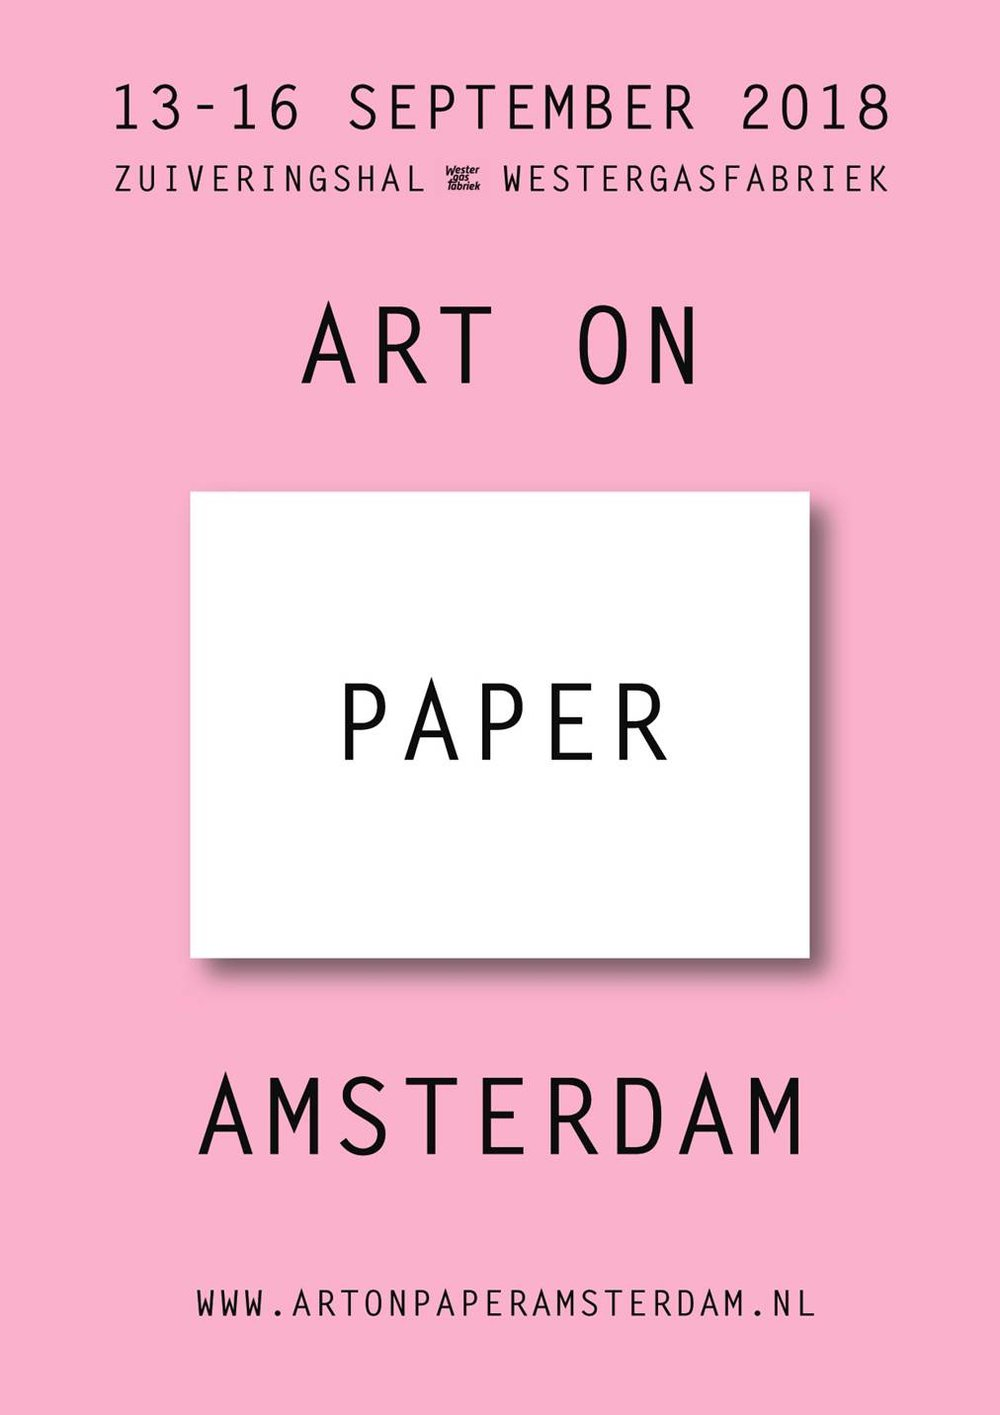 http://www.artonpaperamsterdam.nl/